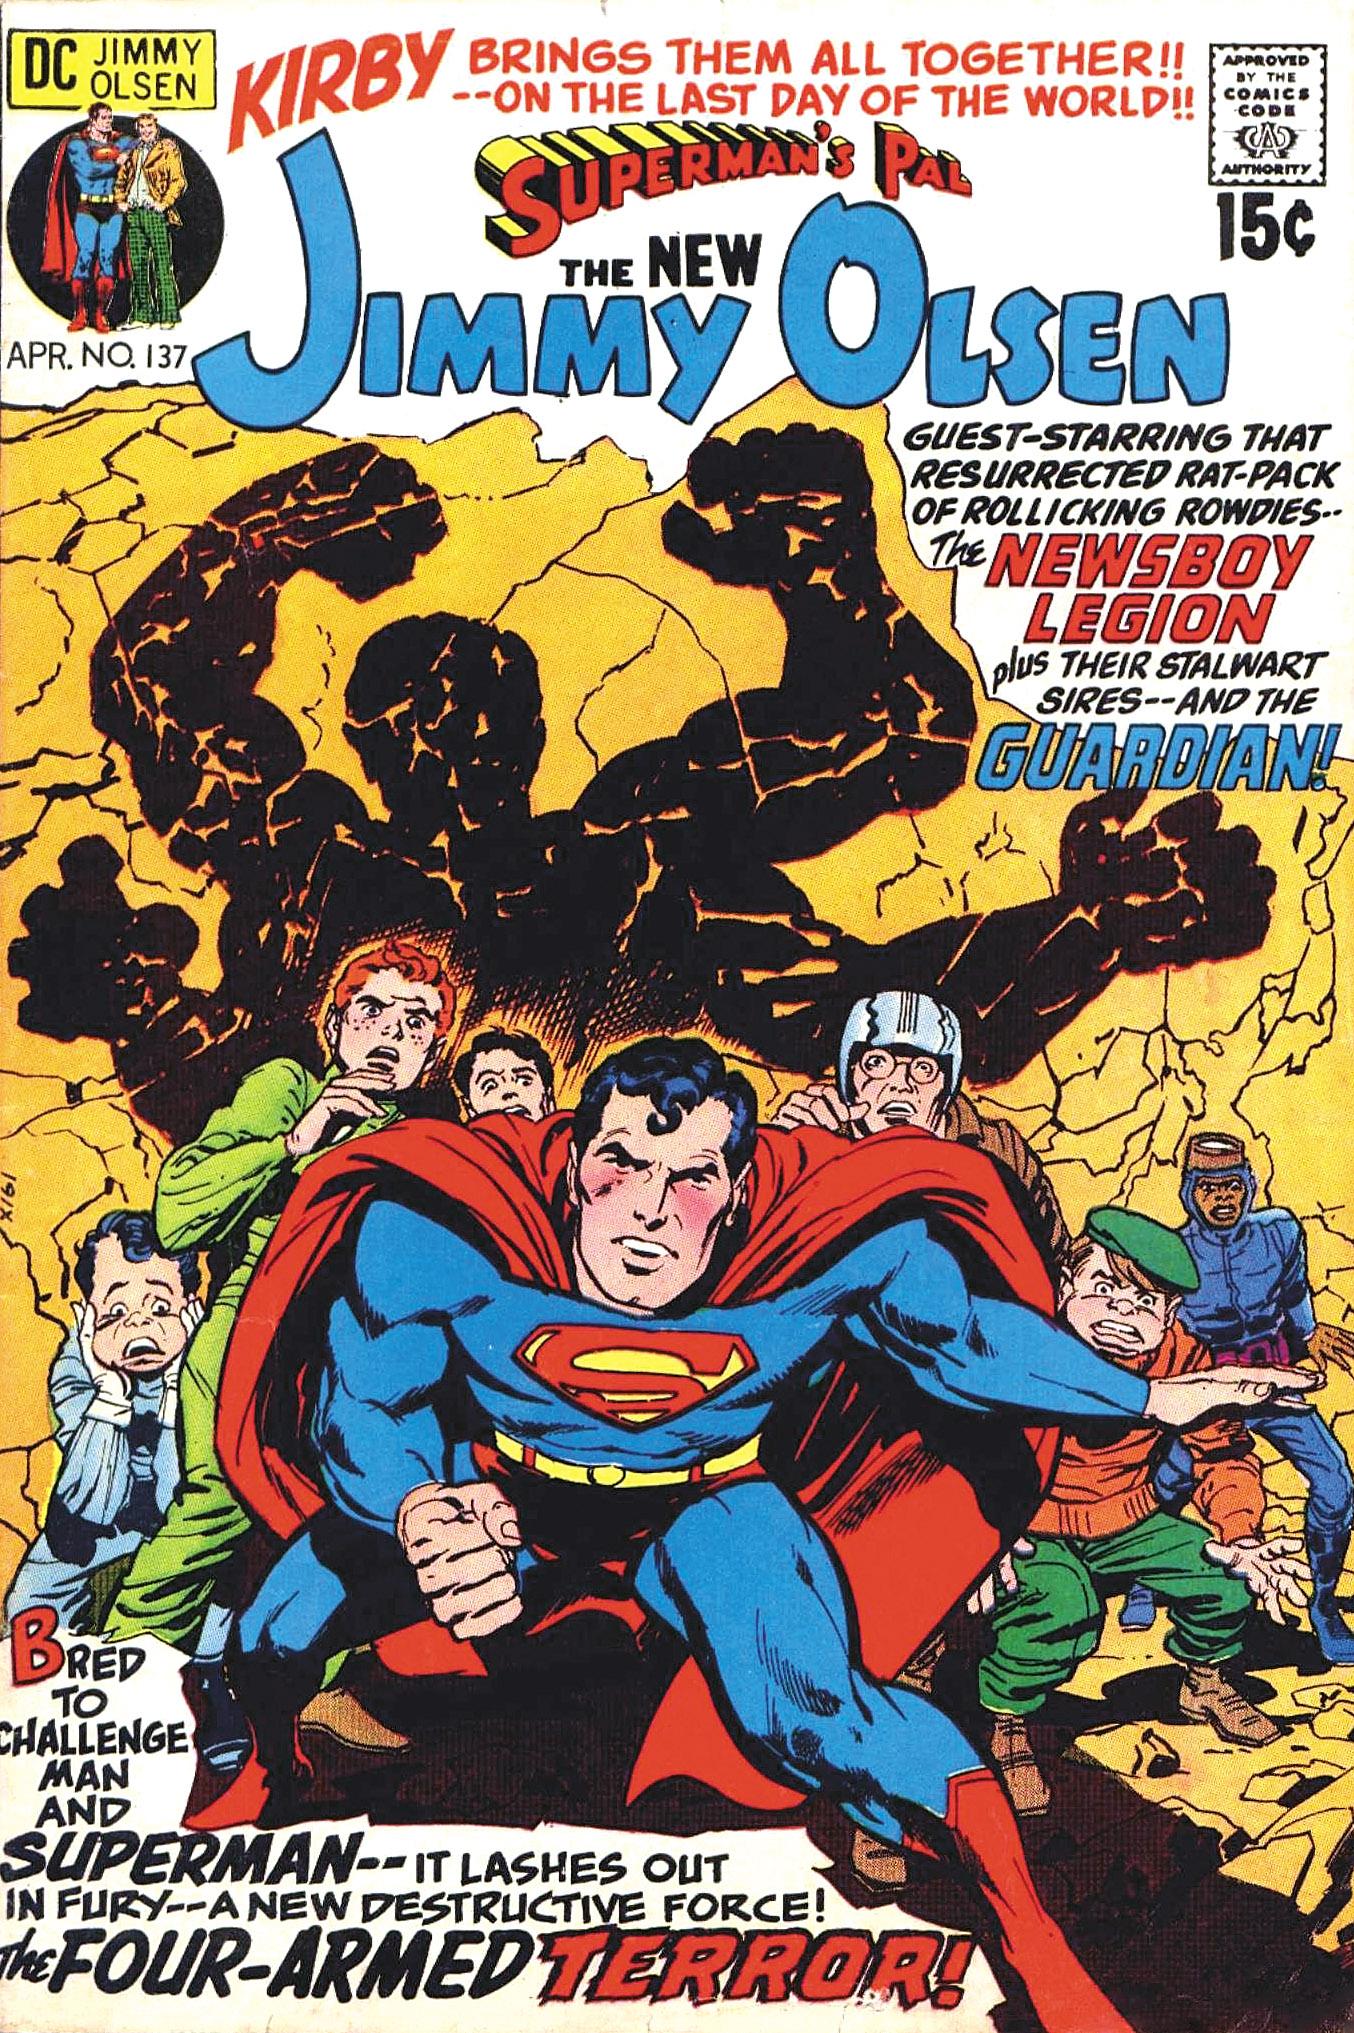 Jimmy Olsen Superman's Pal